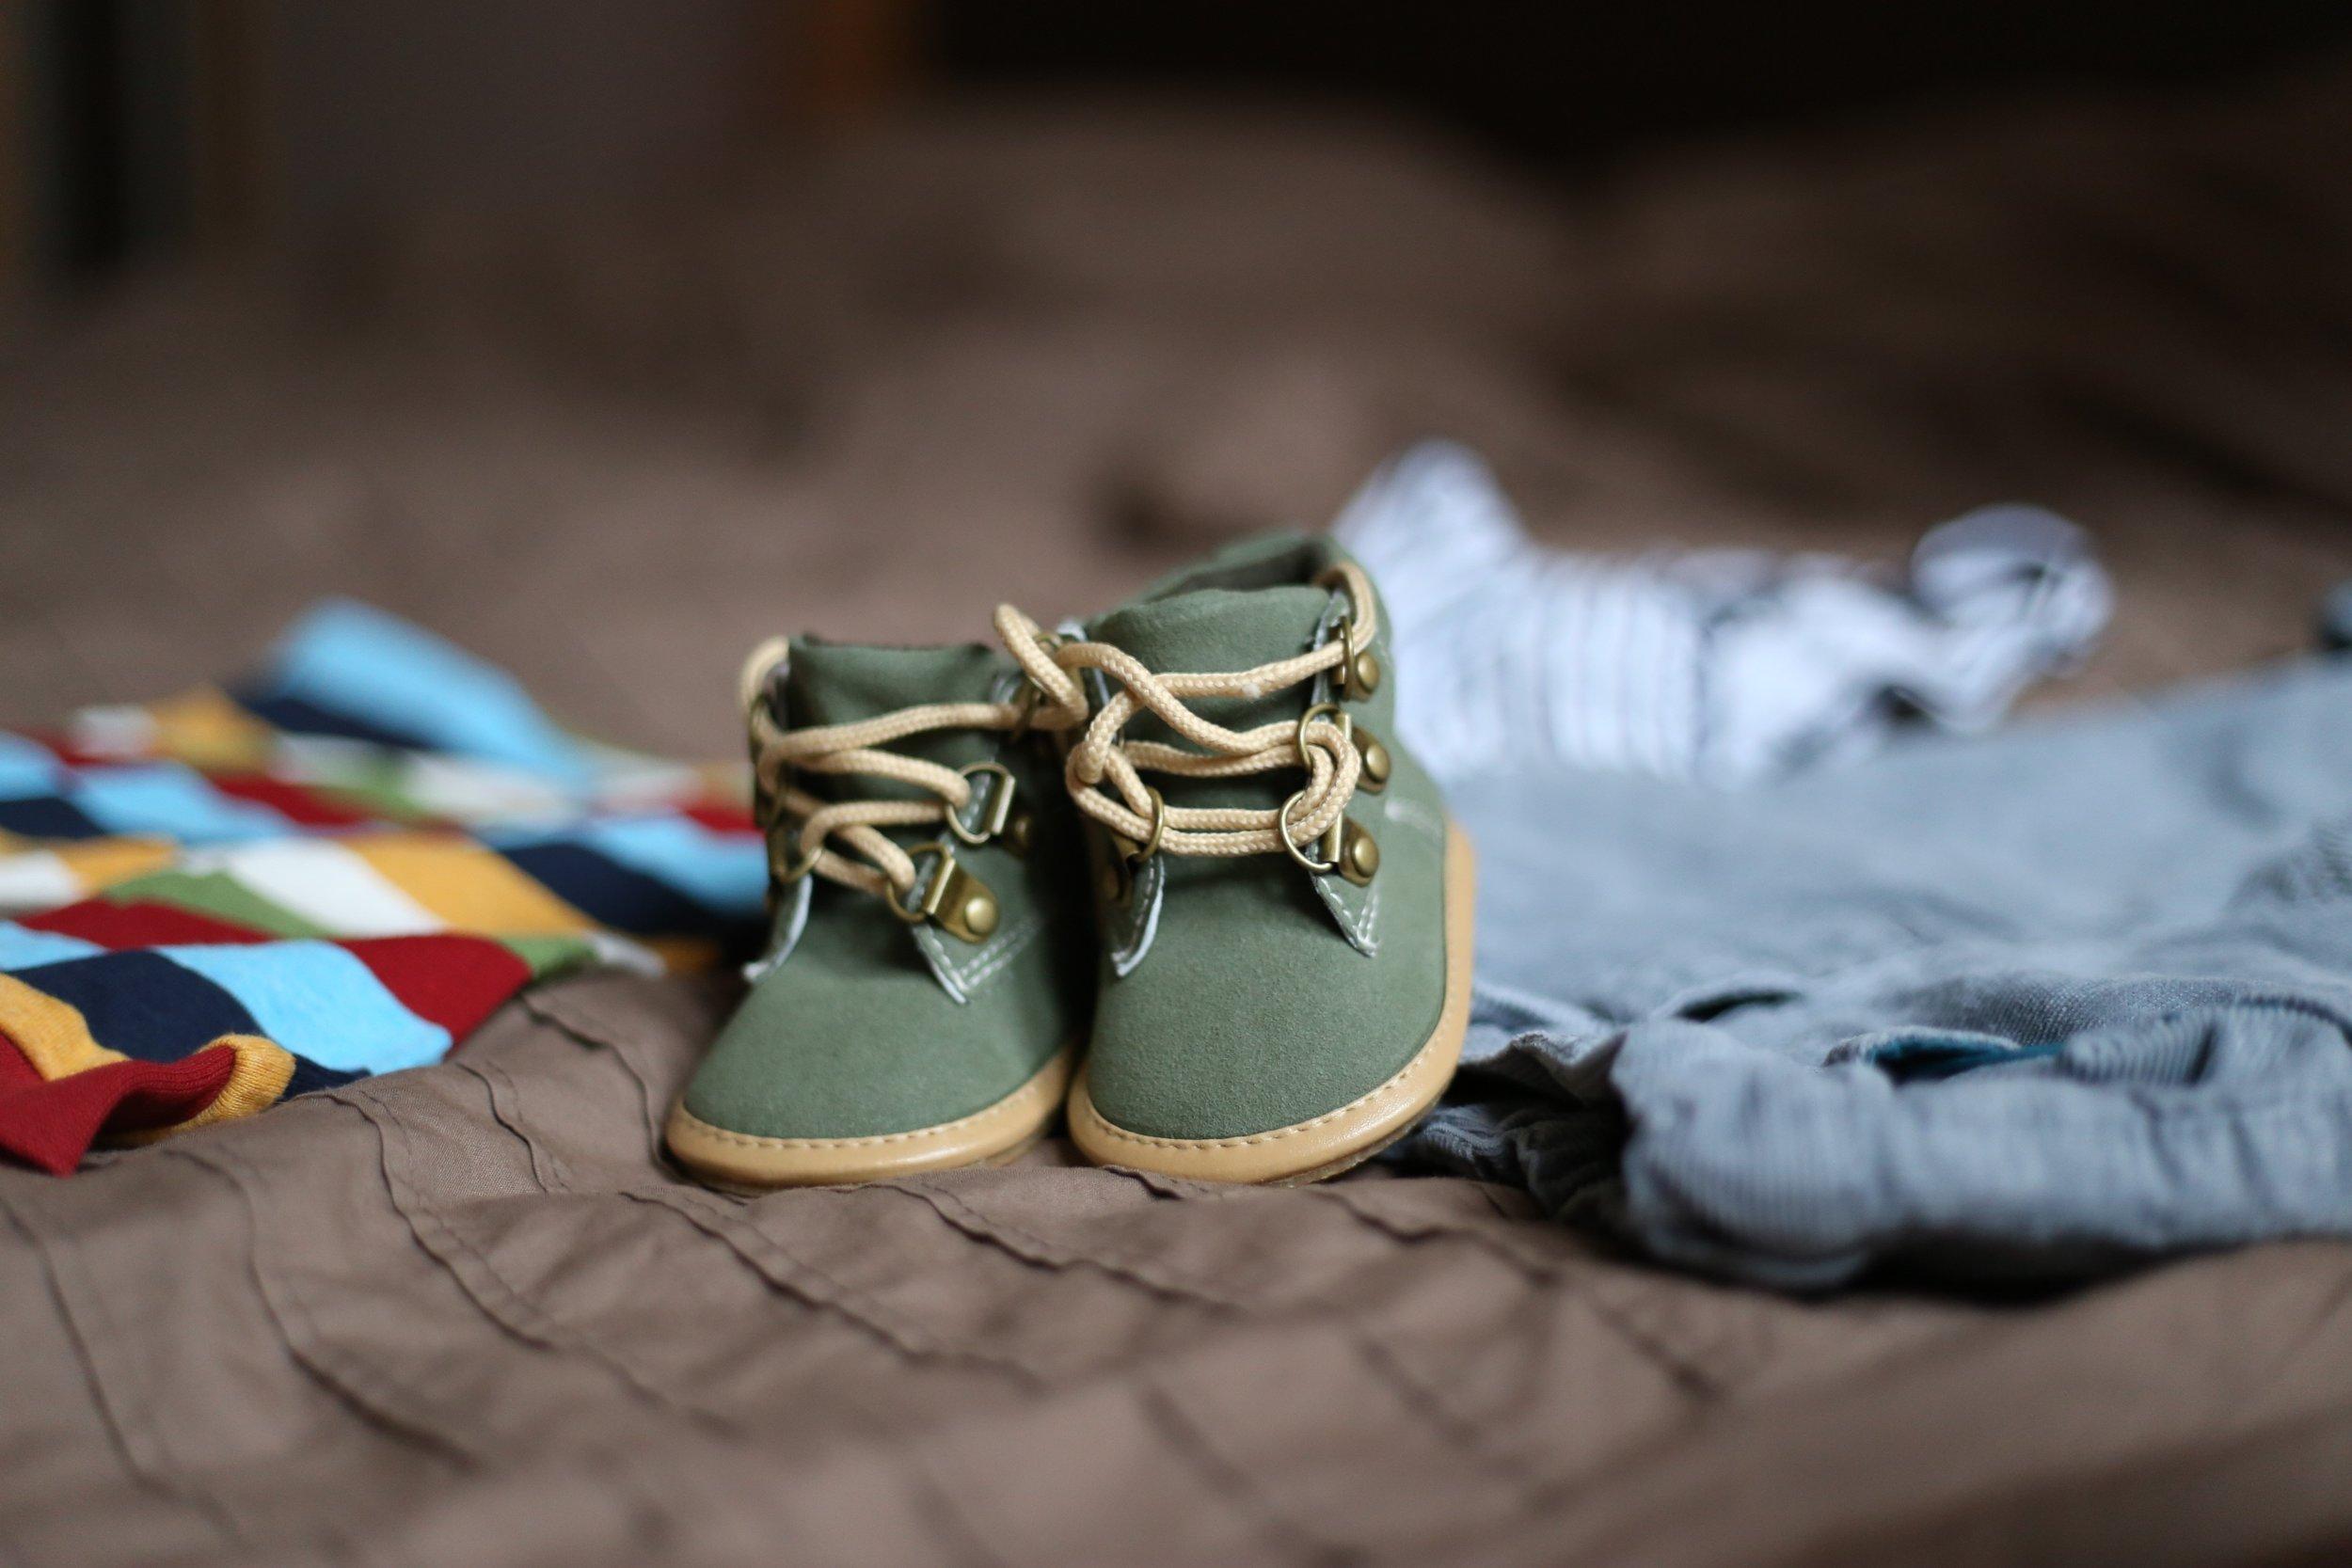 shoe-spring-child-blue-clothing-pregnancy-778454-pxhere.com.jpg